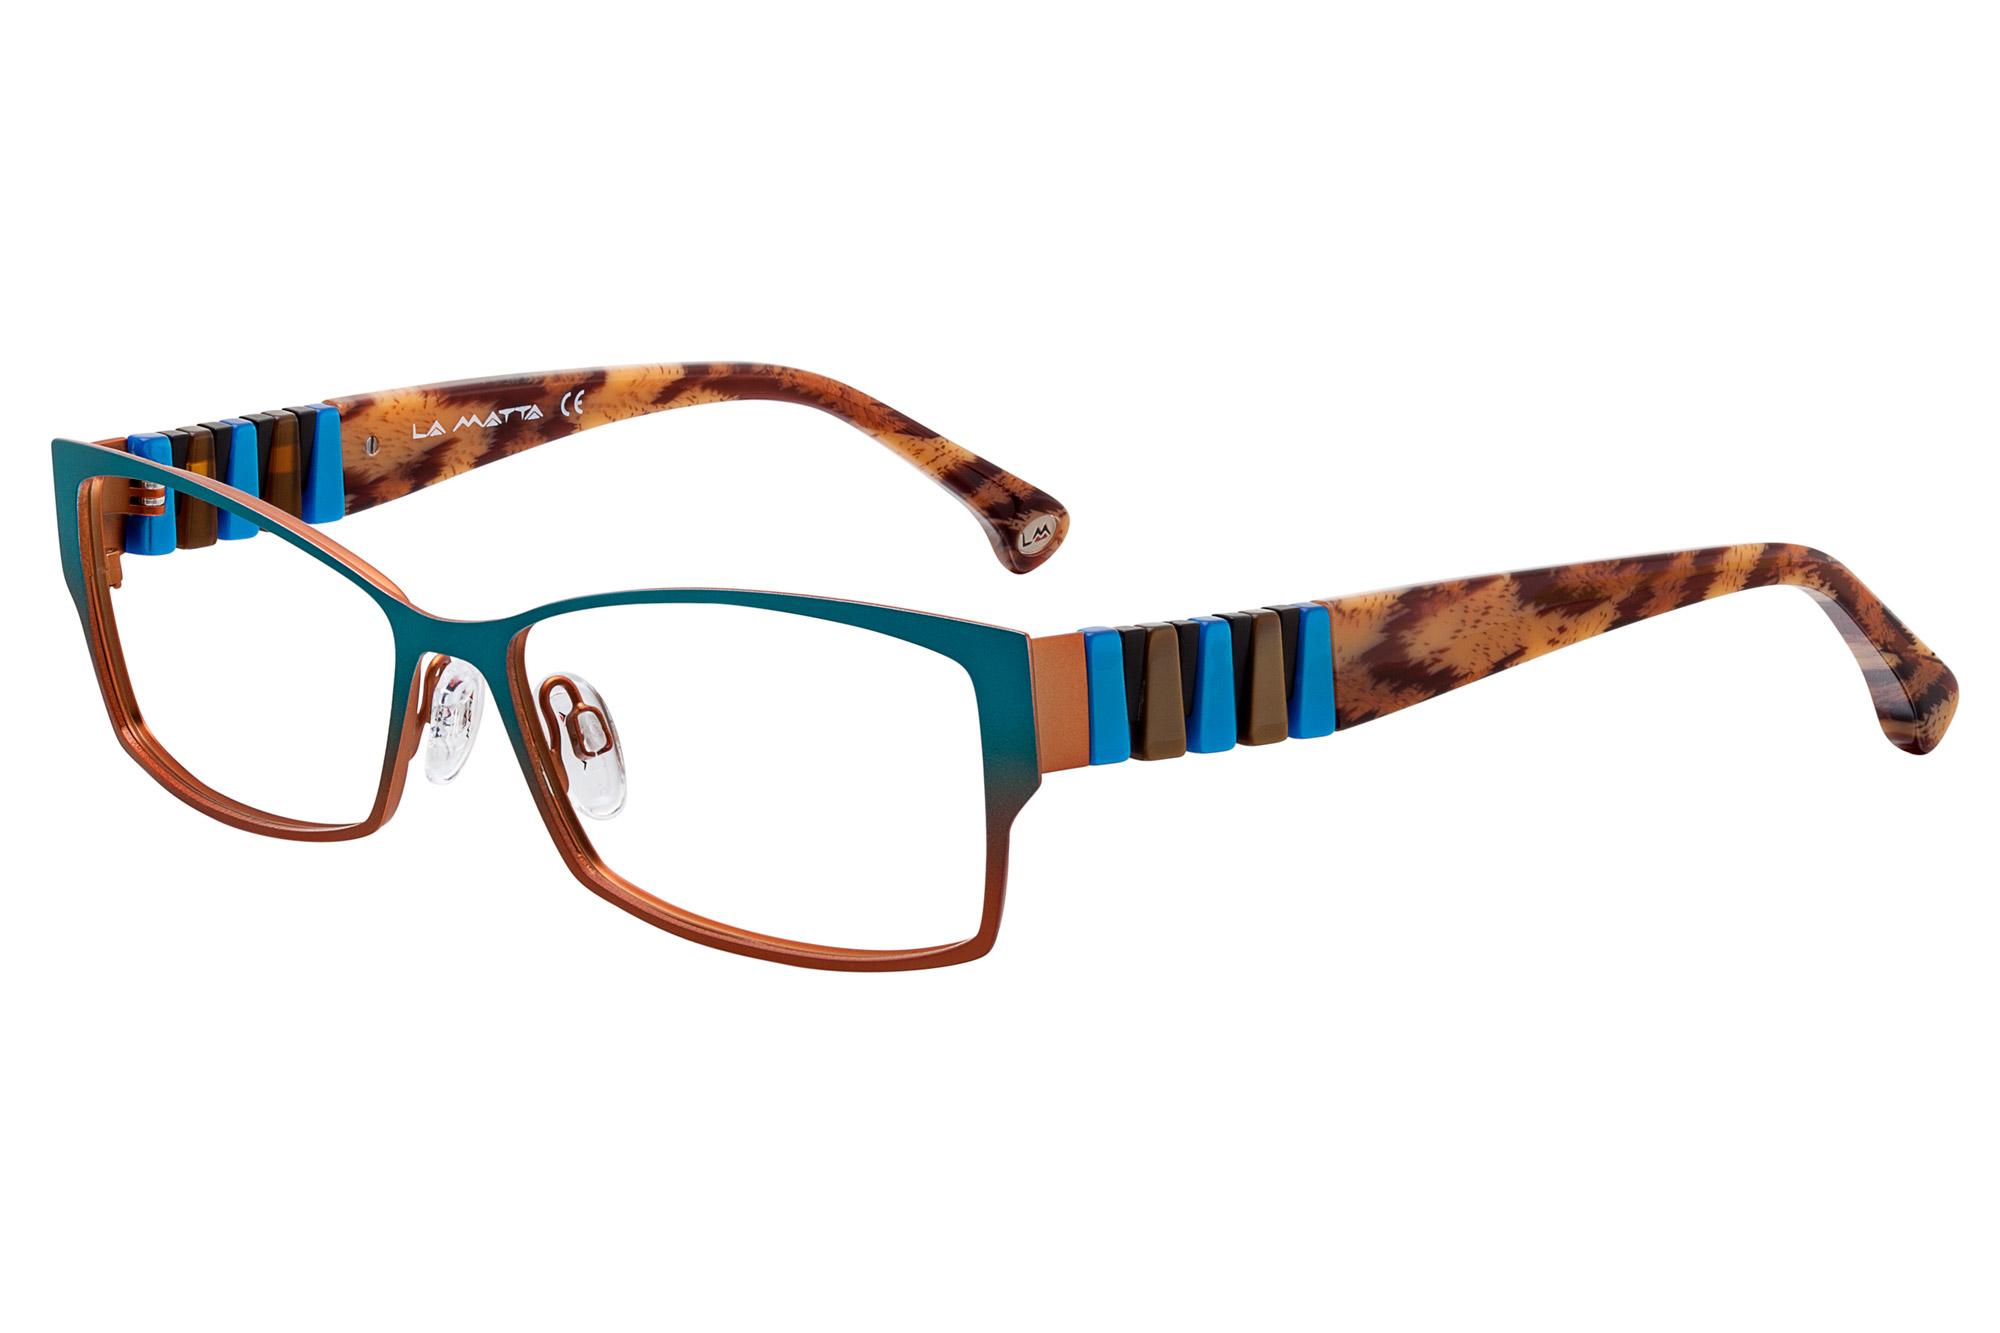 Eyeglass Frames Venice Italy : LA MATTA LMV-3181 VENEZIA ORO OCCHIALI Venice Eyewear ...